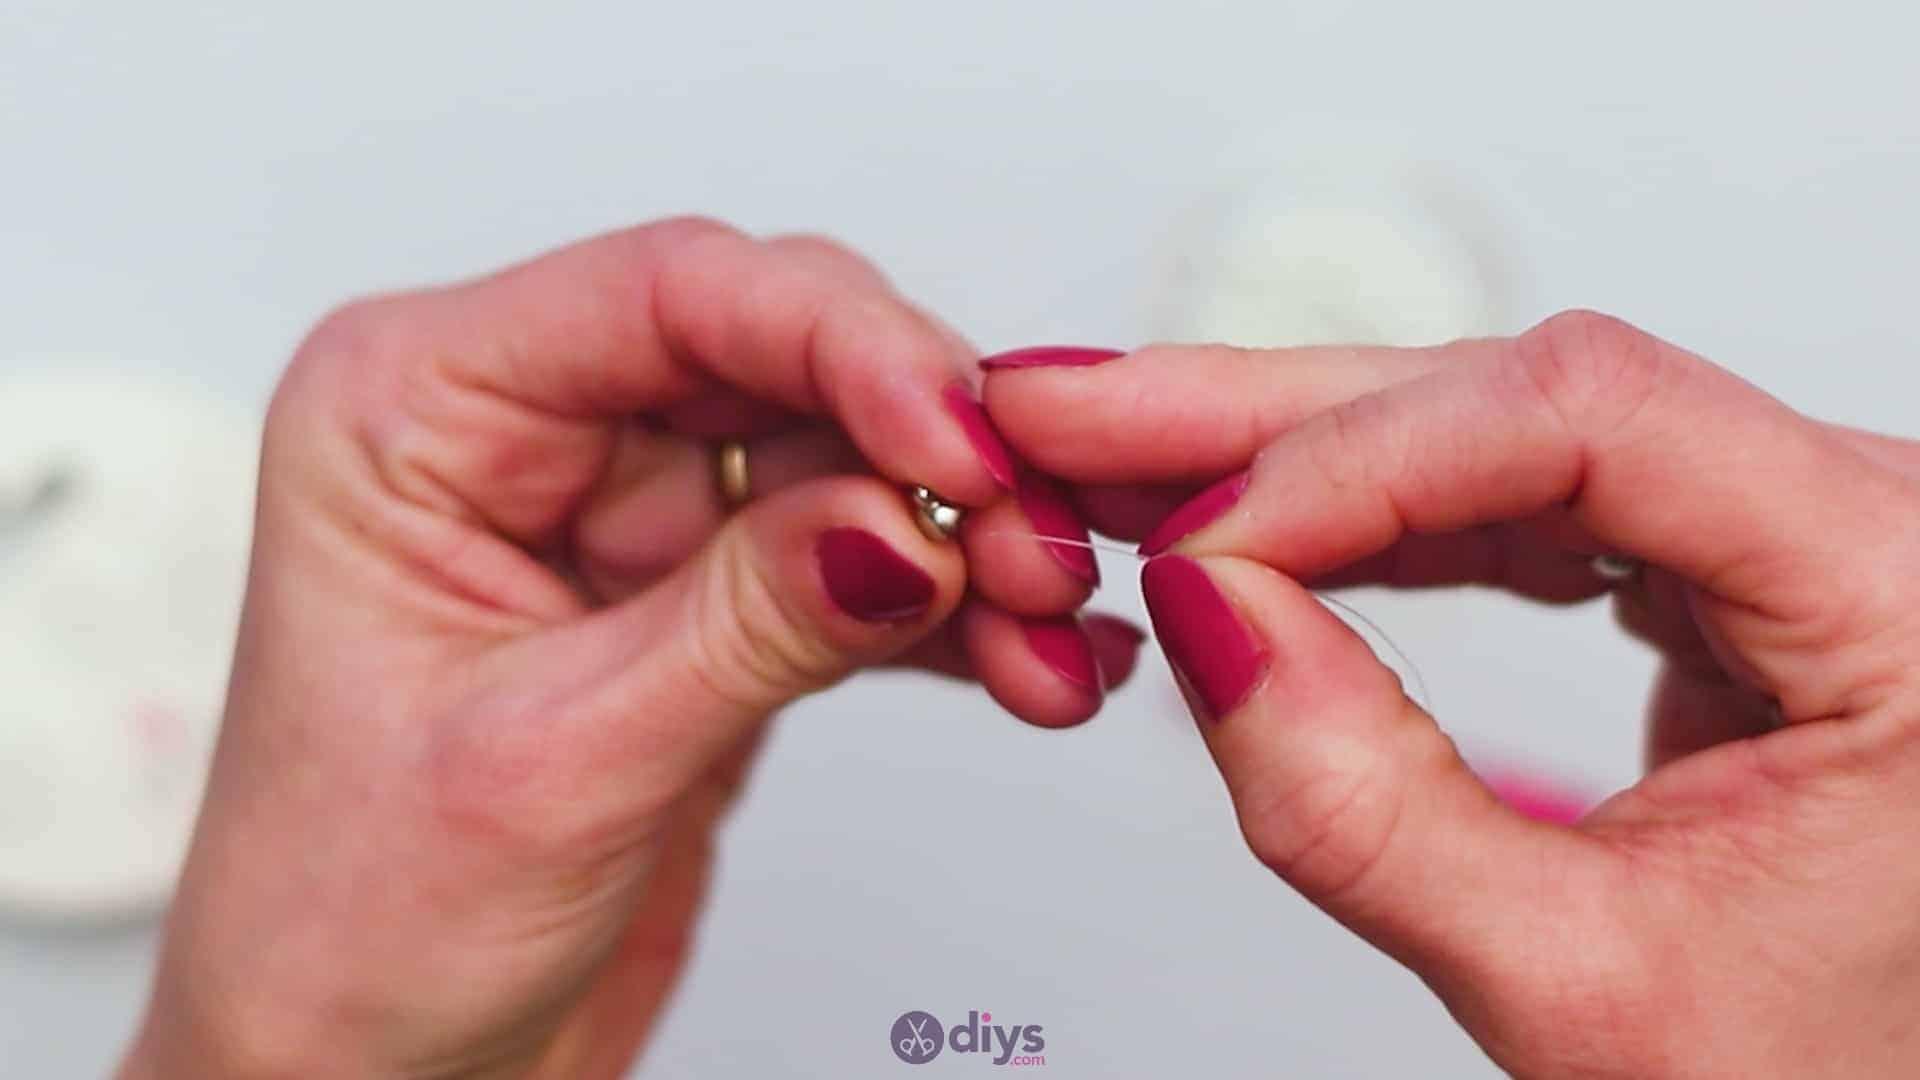 Diy elegant white beads bracelet step 1b